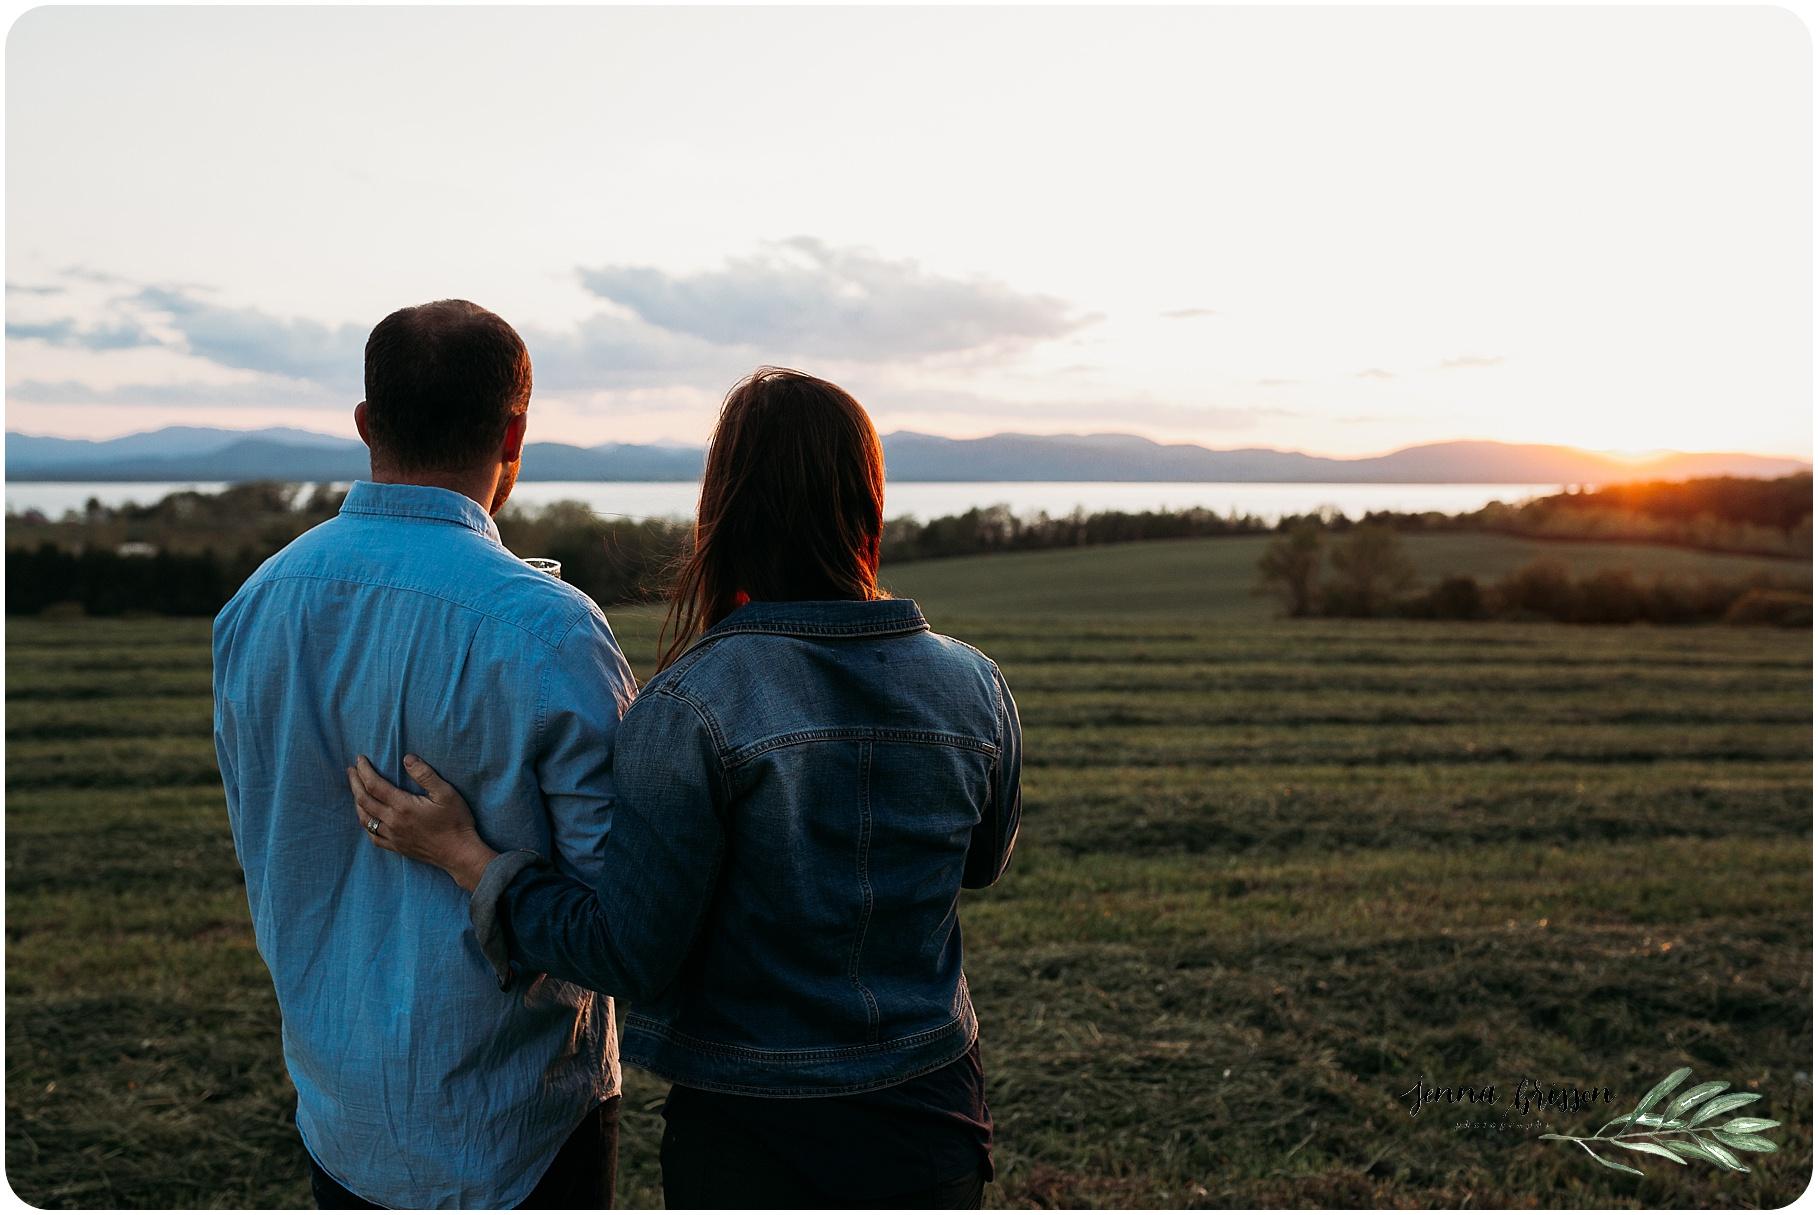 Shelburne Farms Vermont Engagement Session 2 - Jenna Brisson Photography